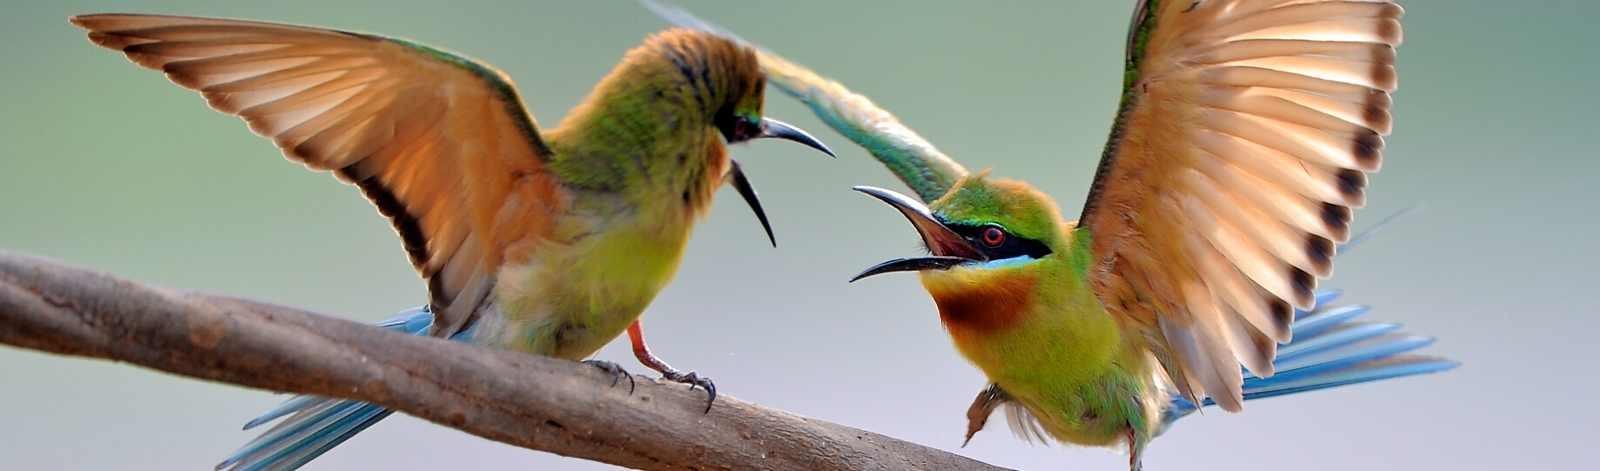 birdiefightpan_110837030